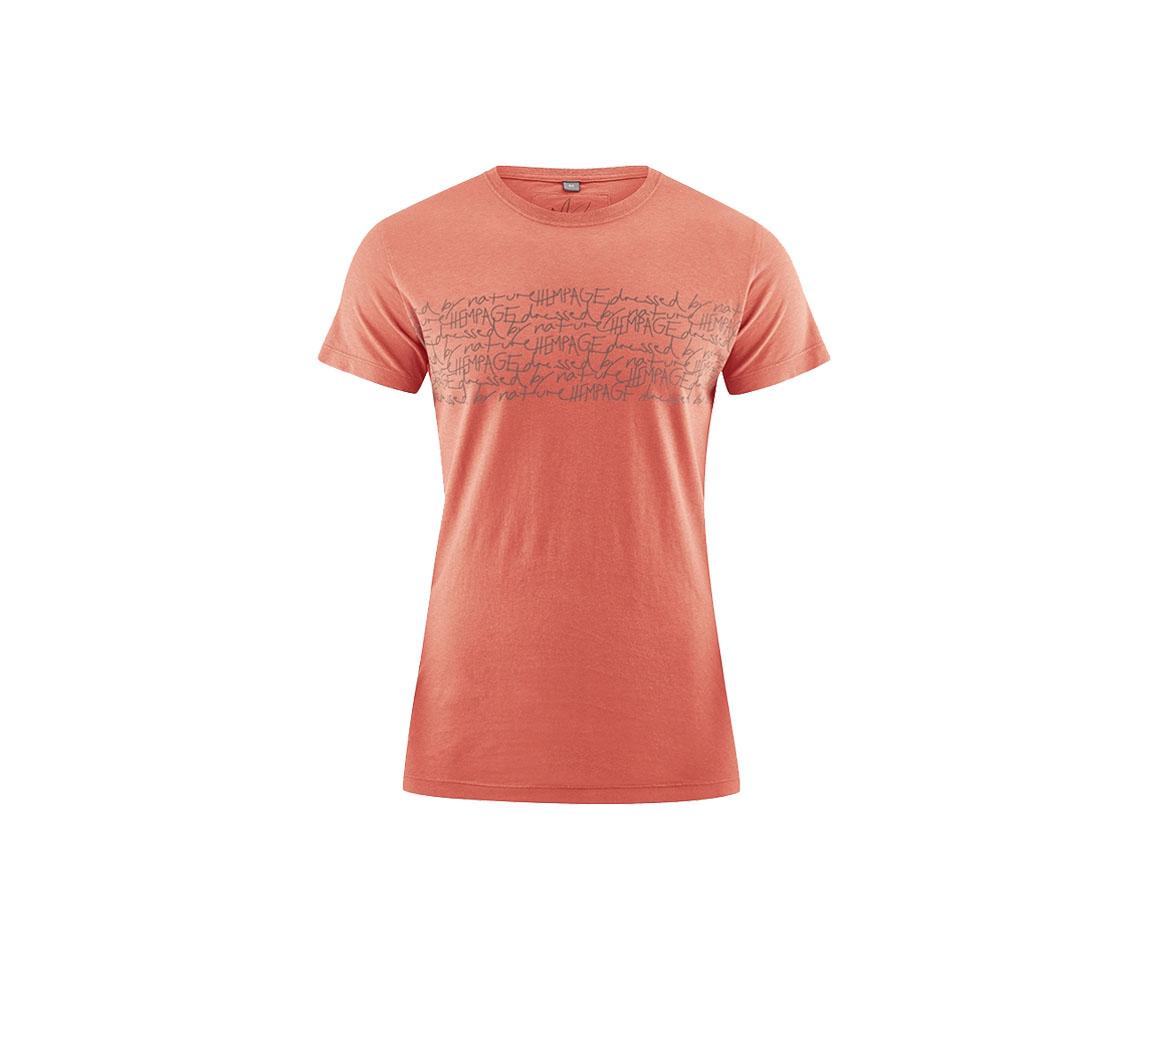 T-shirt Typo en Chanvre T-shirt Typo